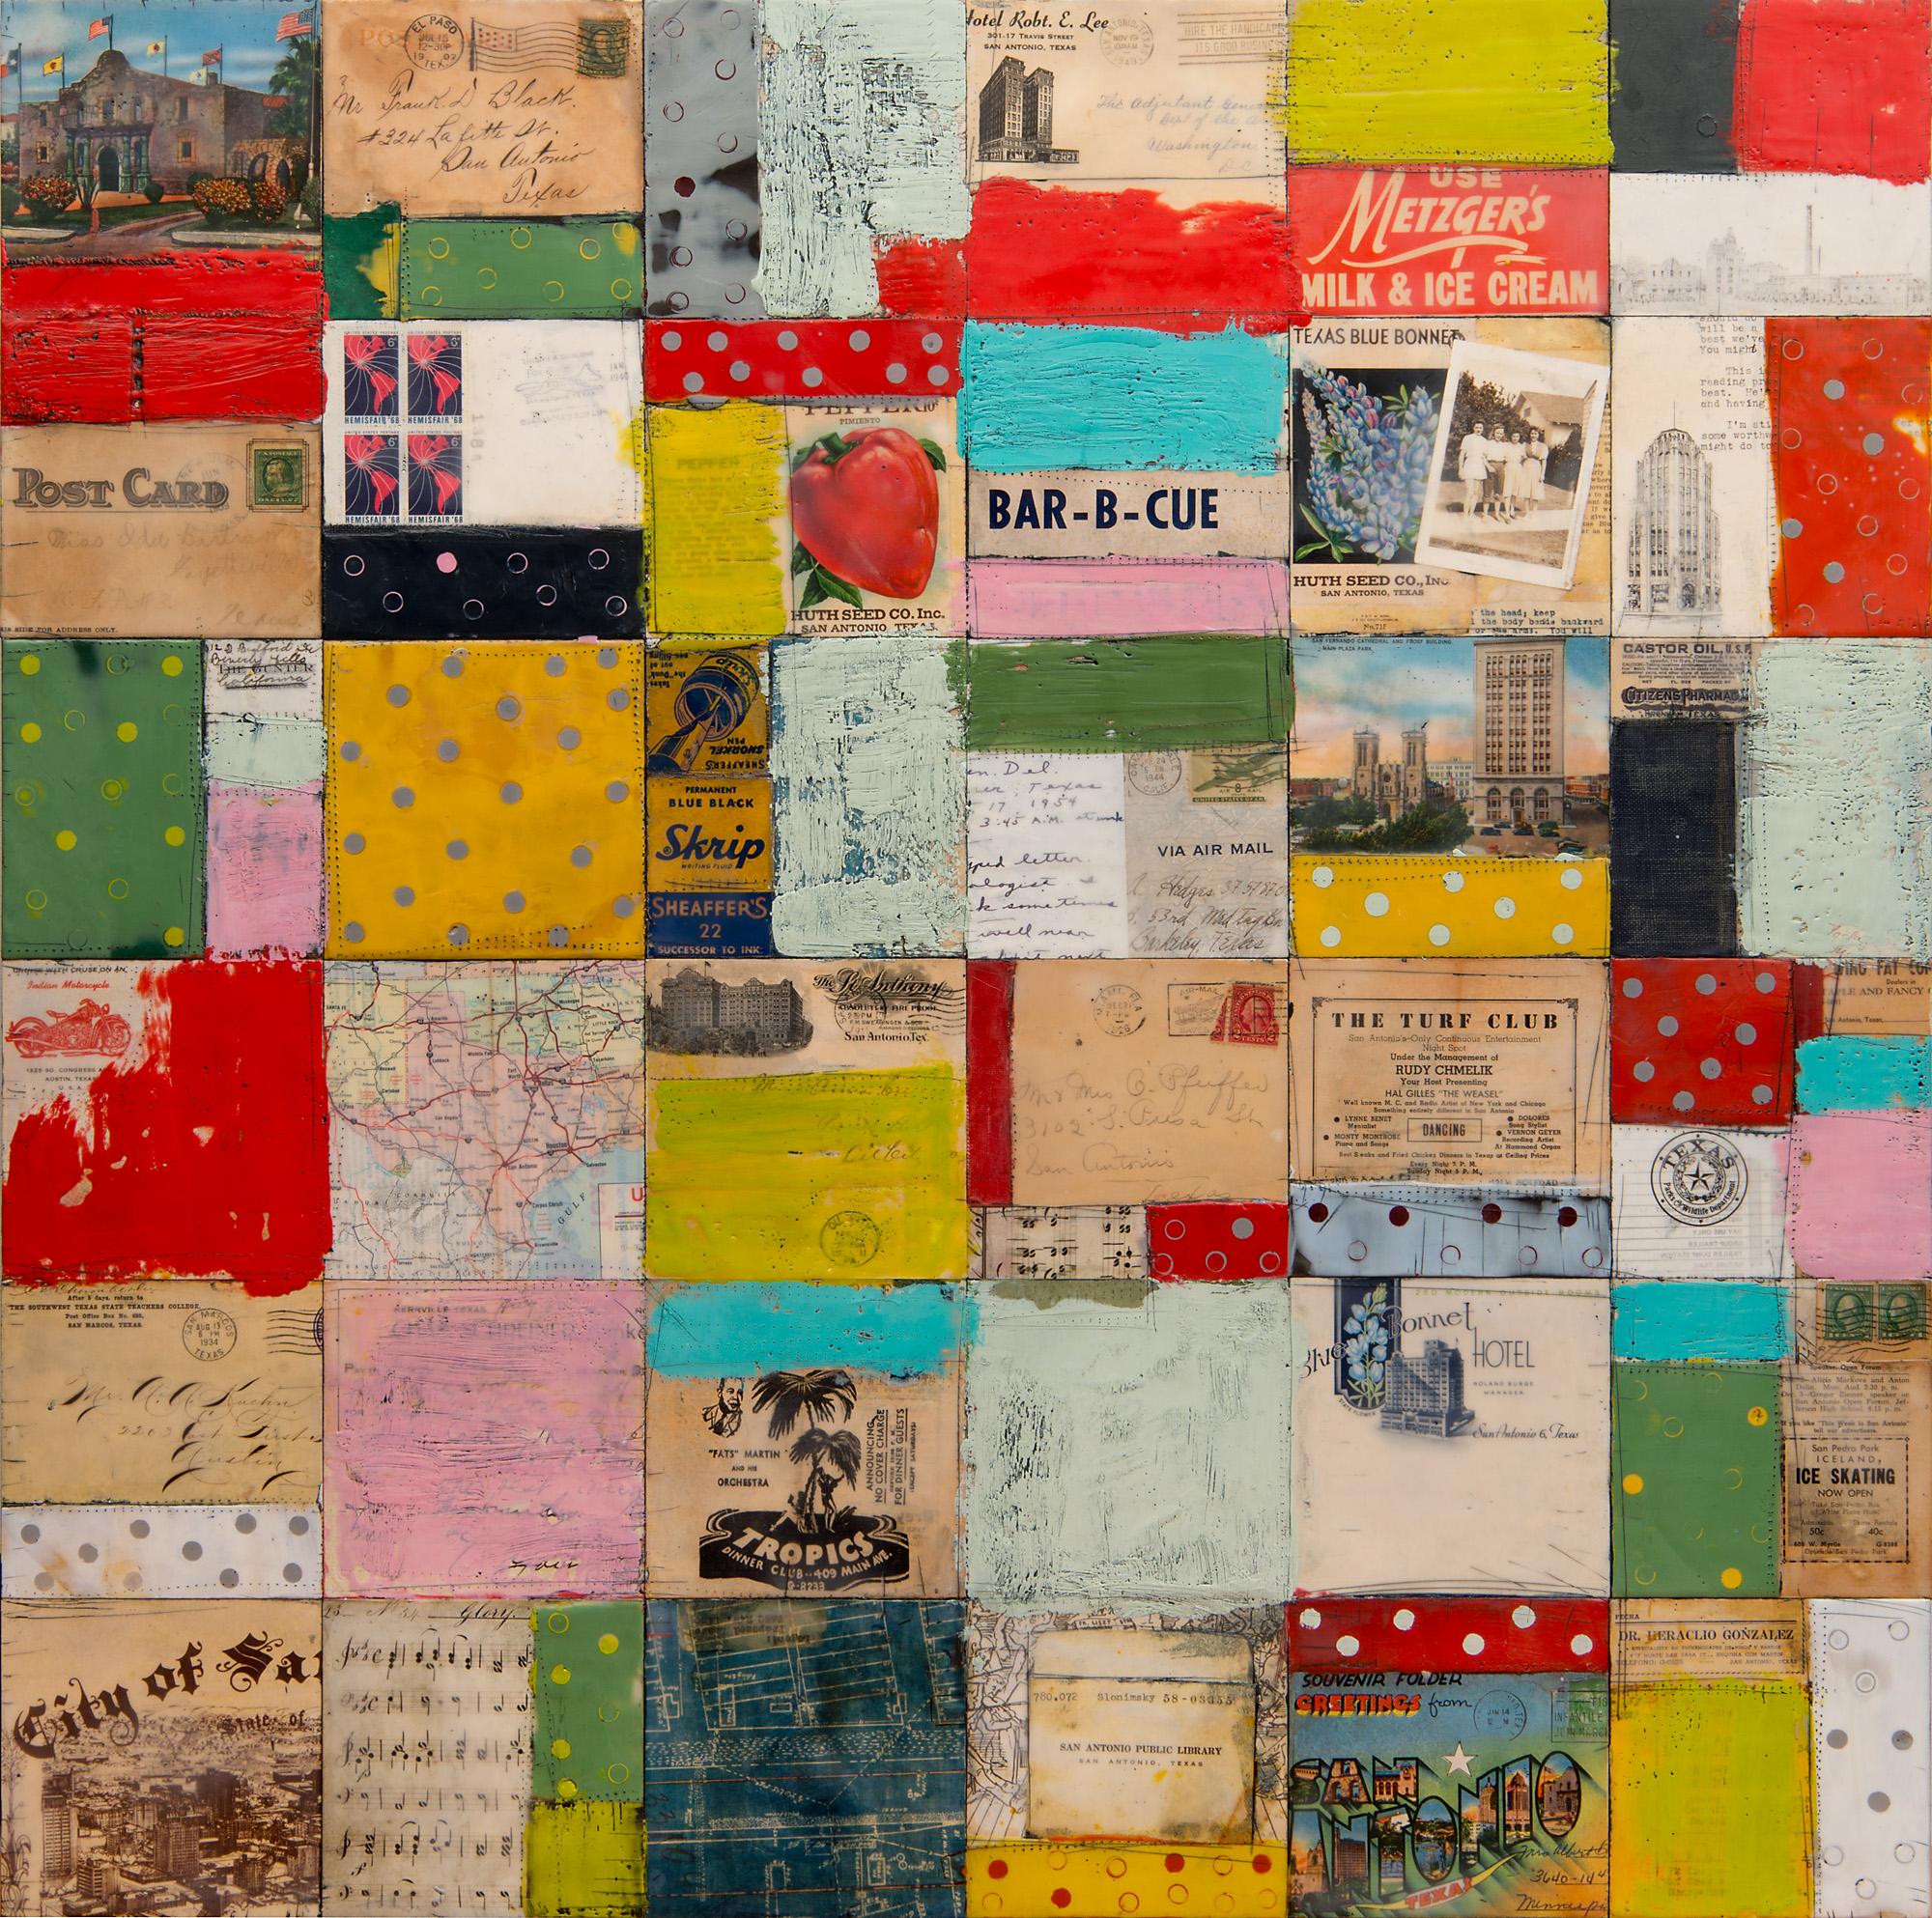 "Greetings from San Antonio, 30"" x 30"", encaustic, oil, collage on cradled wood panel"